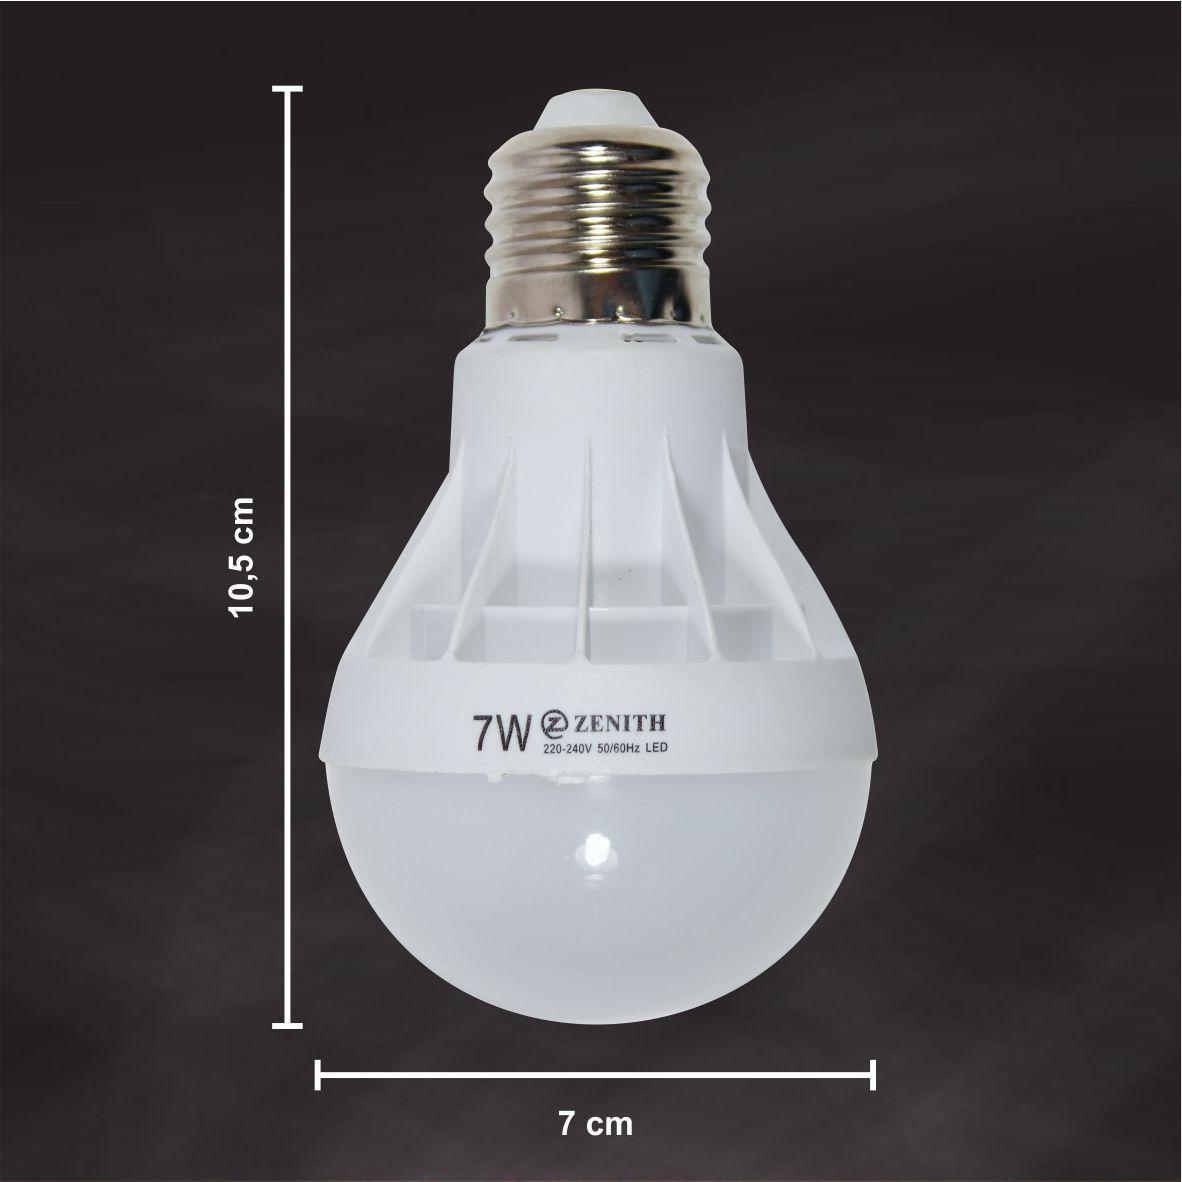 ... WEITECH LAMPU BOHLAM LED ZENITH HEMAT ENERGI DAN AWET 7 WATT 3 PCS - 4 ...